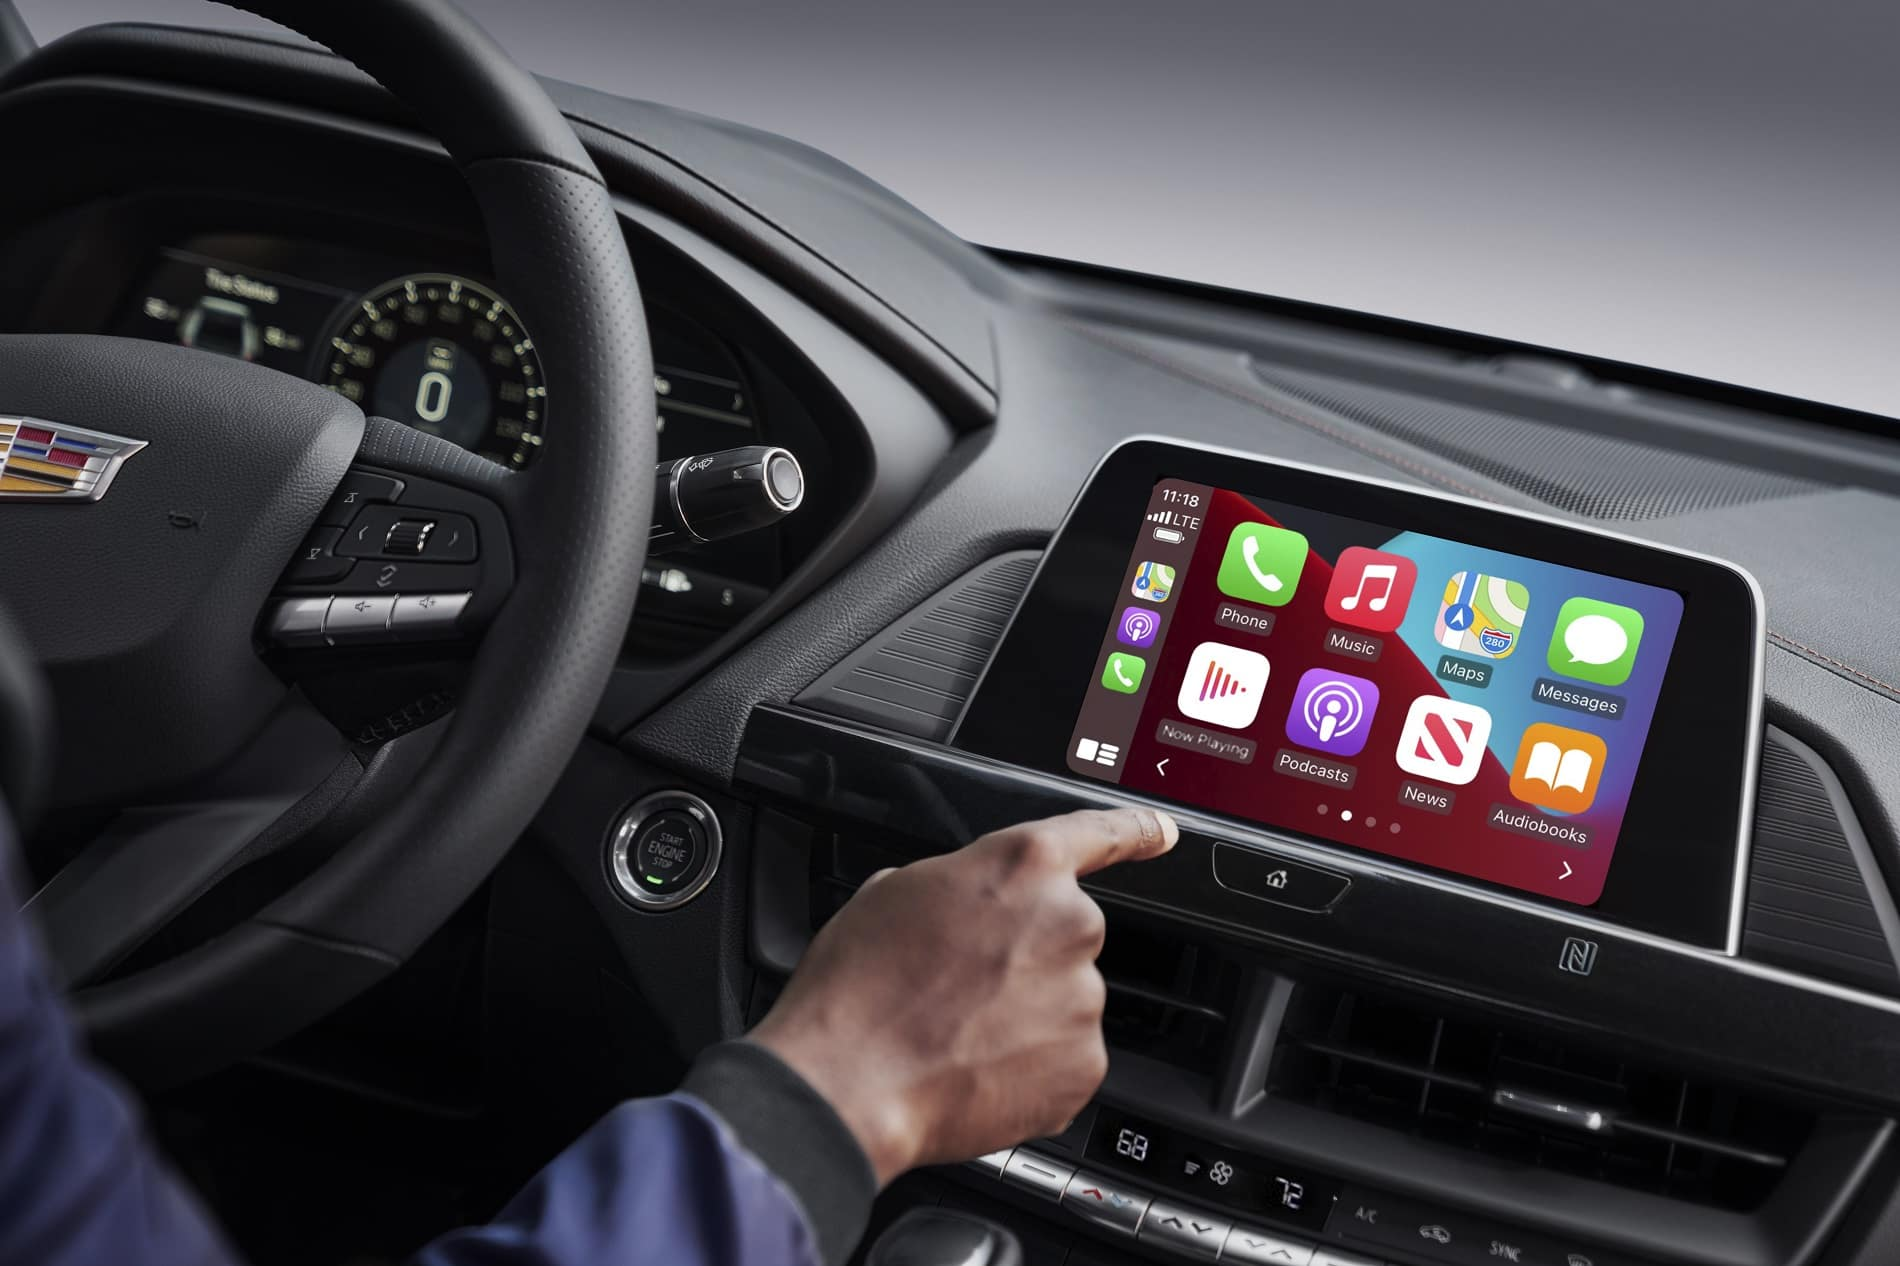 2021 Cadillac CT4 Interior Apple CarPlay™ Technology